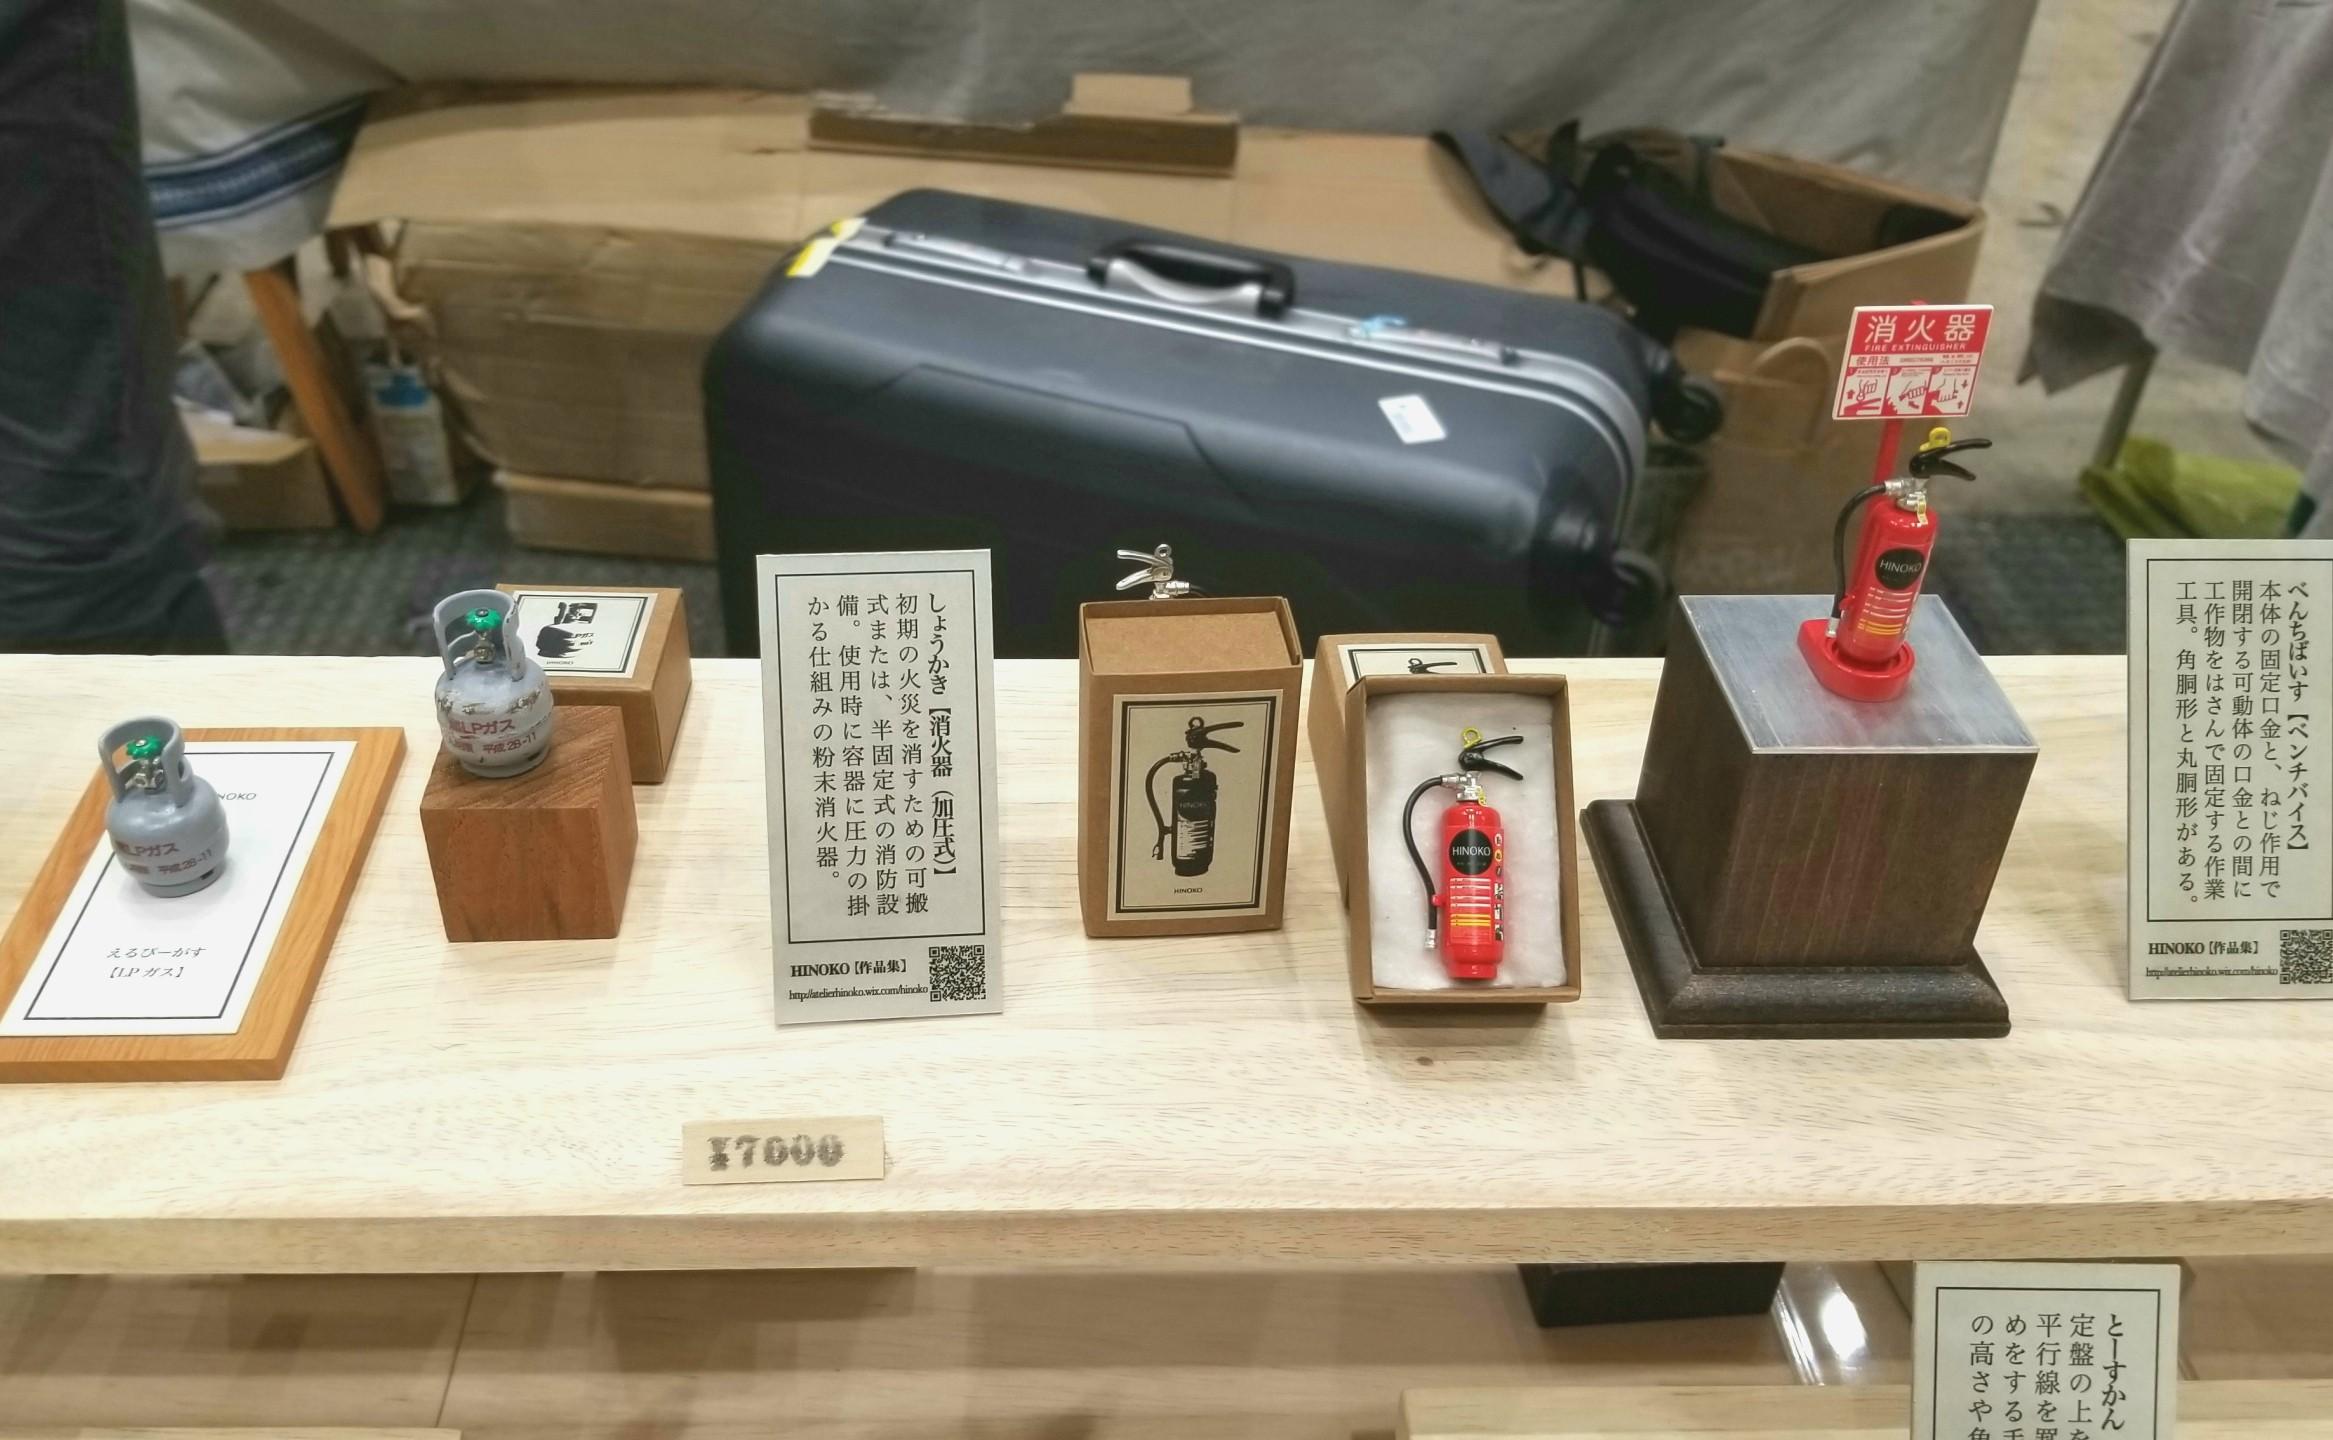 HINOKO,ミニチュア,工具,消火器,ガスボンベ,ハンドメイド